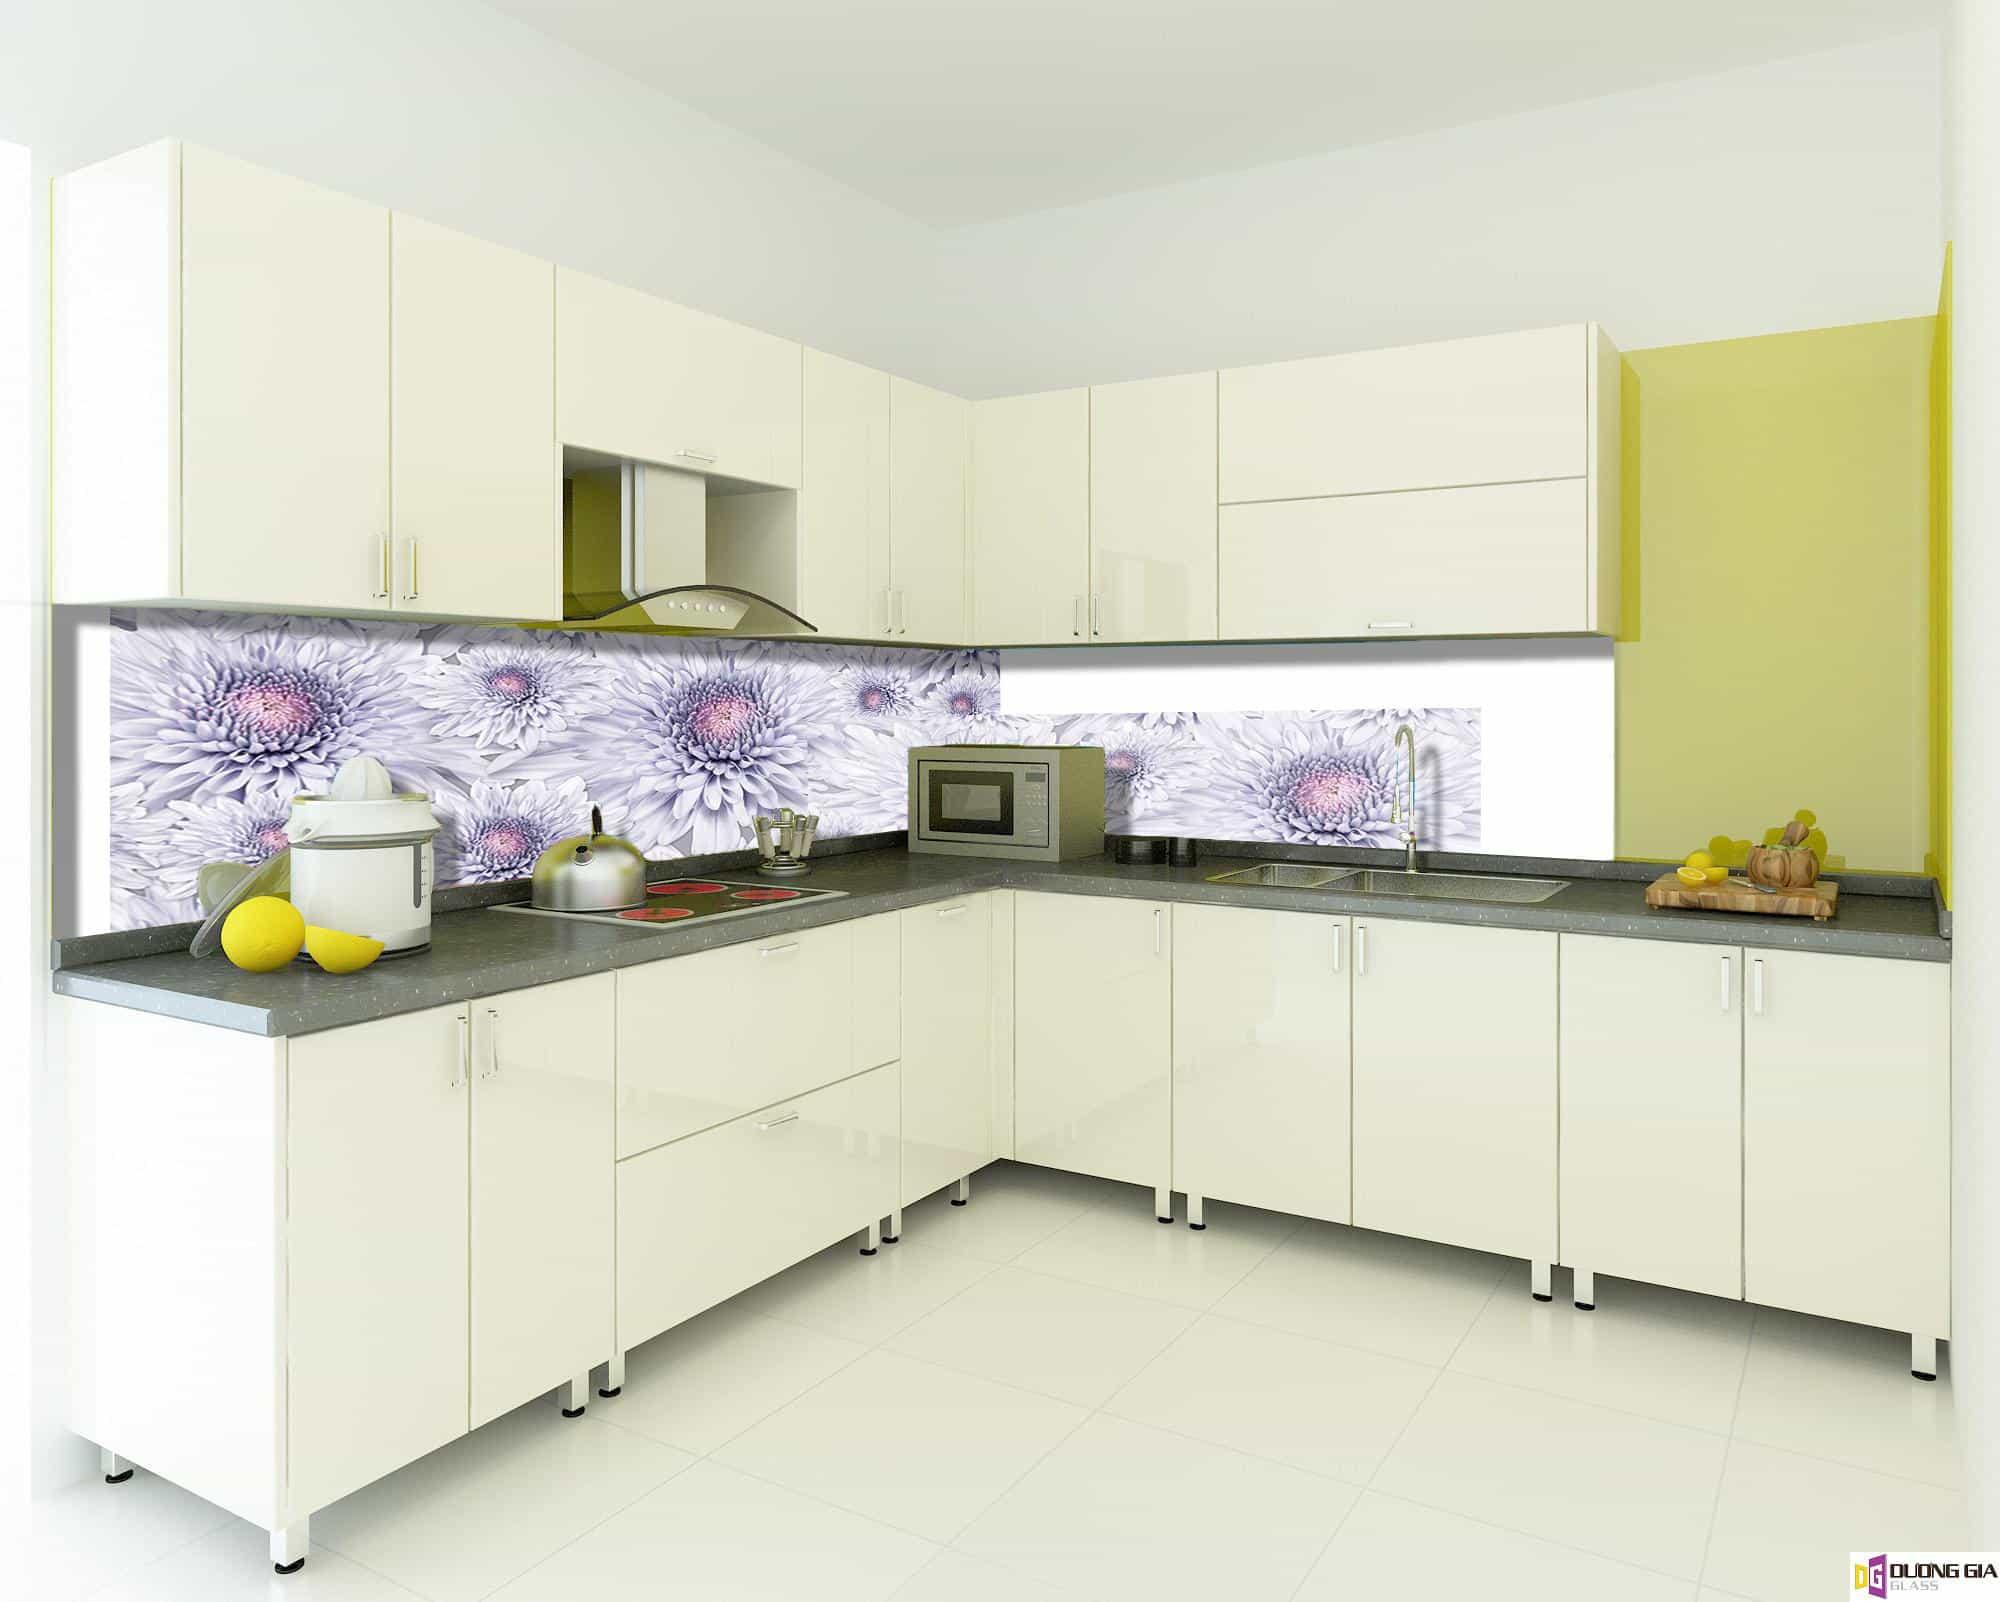 Kính ốp bếp 3D mẫu 58